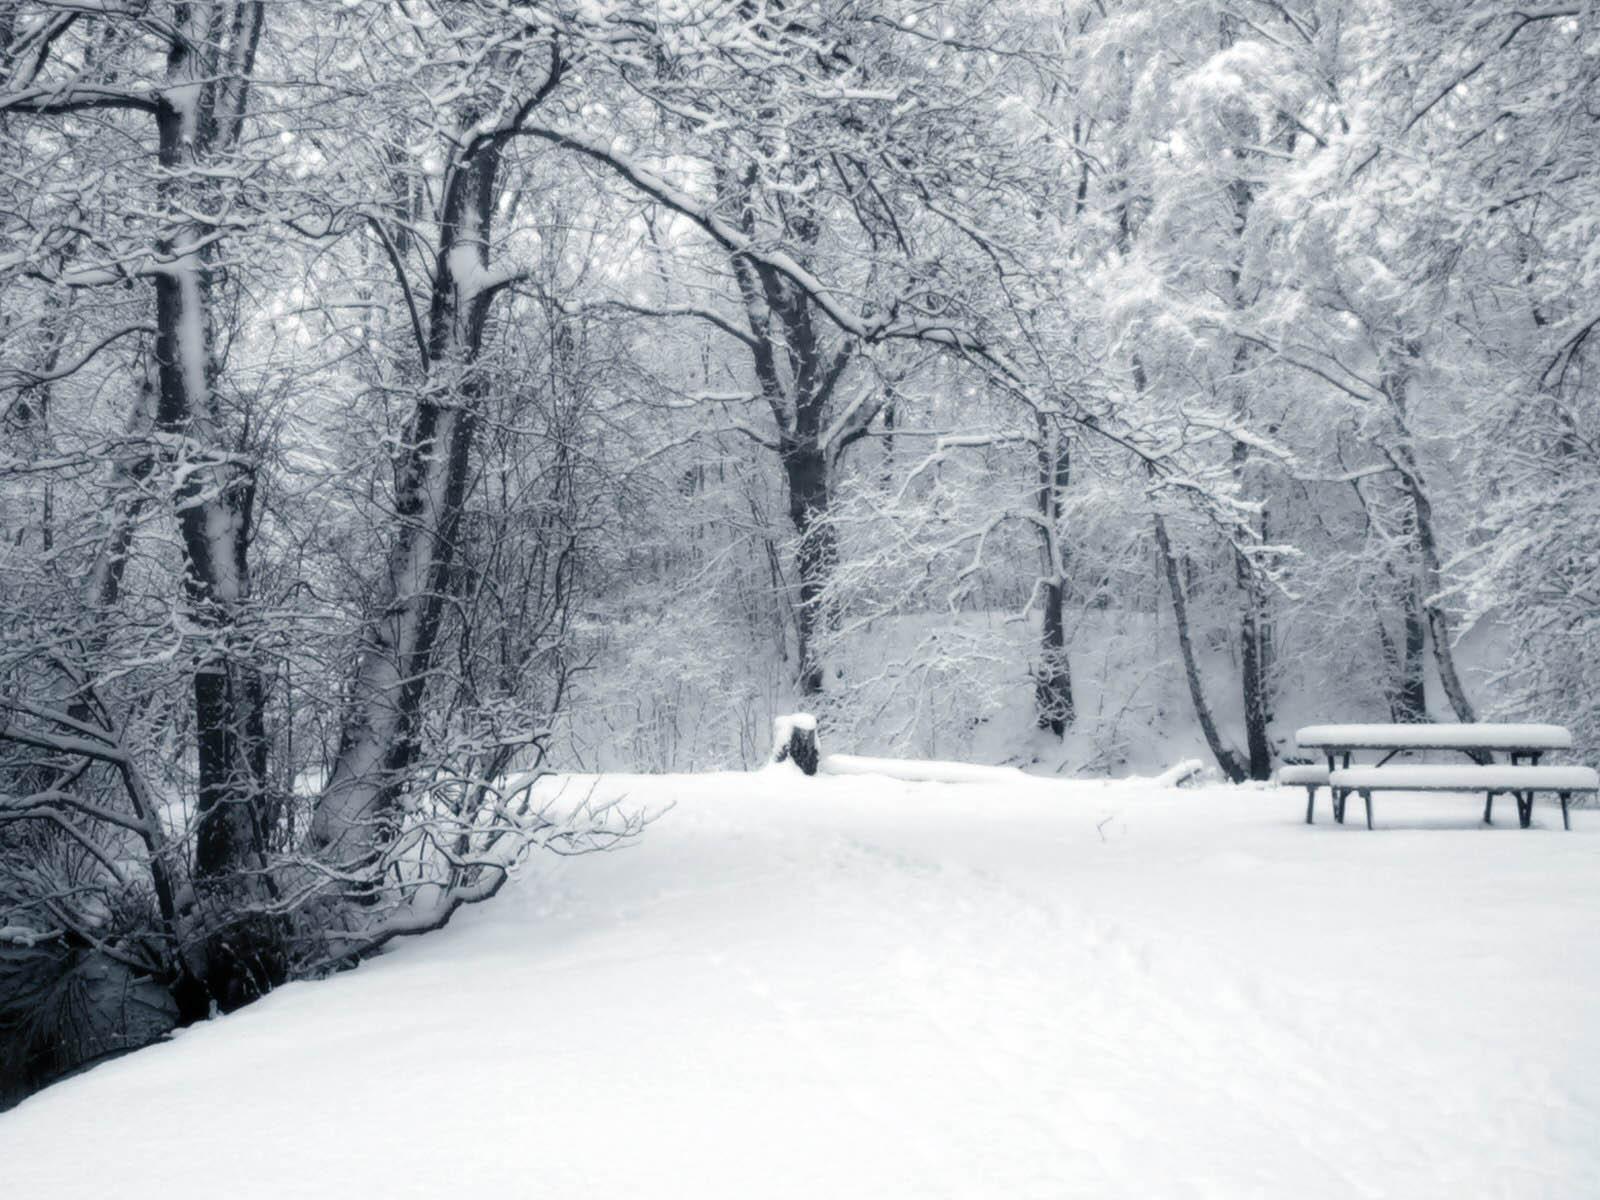 Snow Background Tumblr